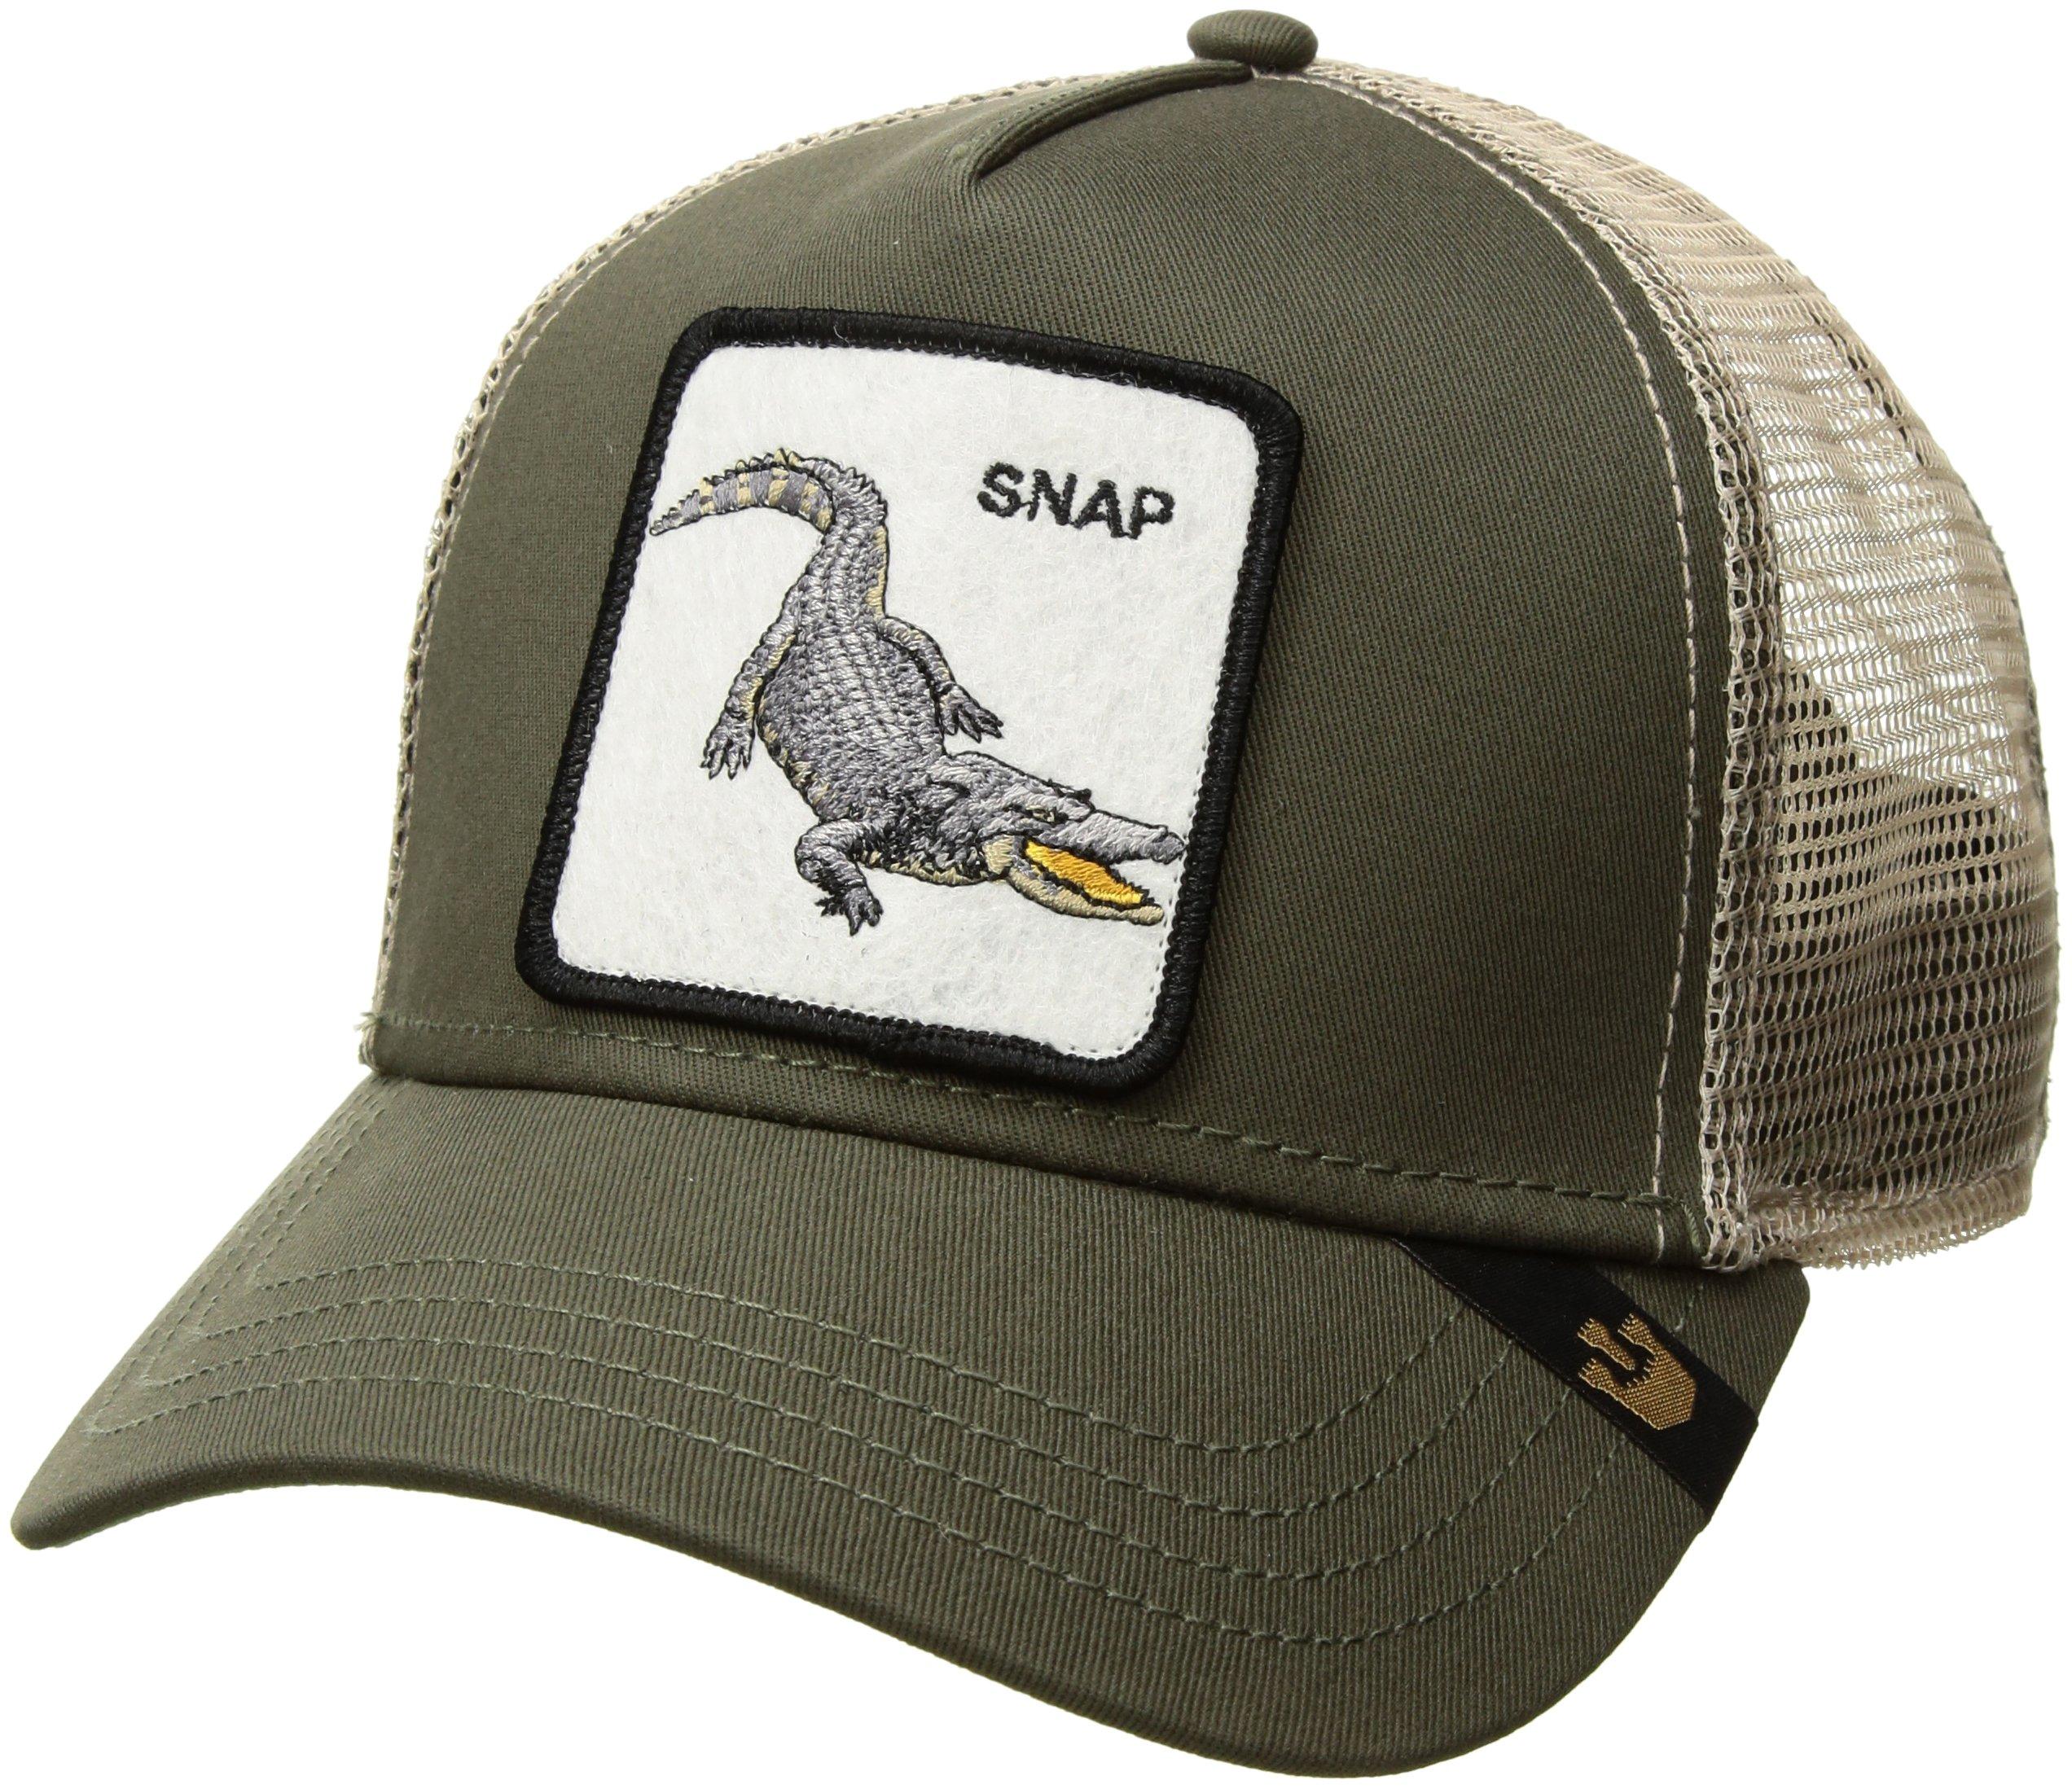 Goorin Bros. Men's Animal Farm Snap Back Trucker Hat, Olive Crocodile, One Size